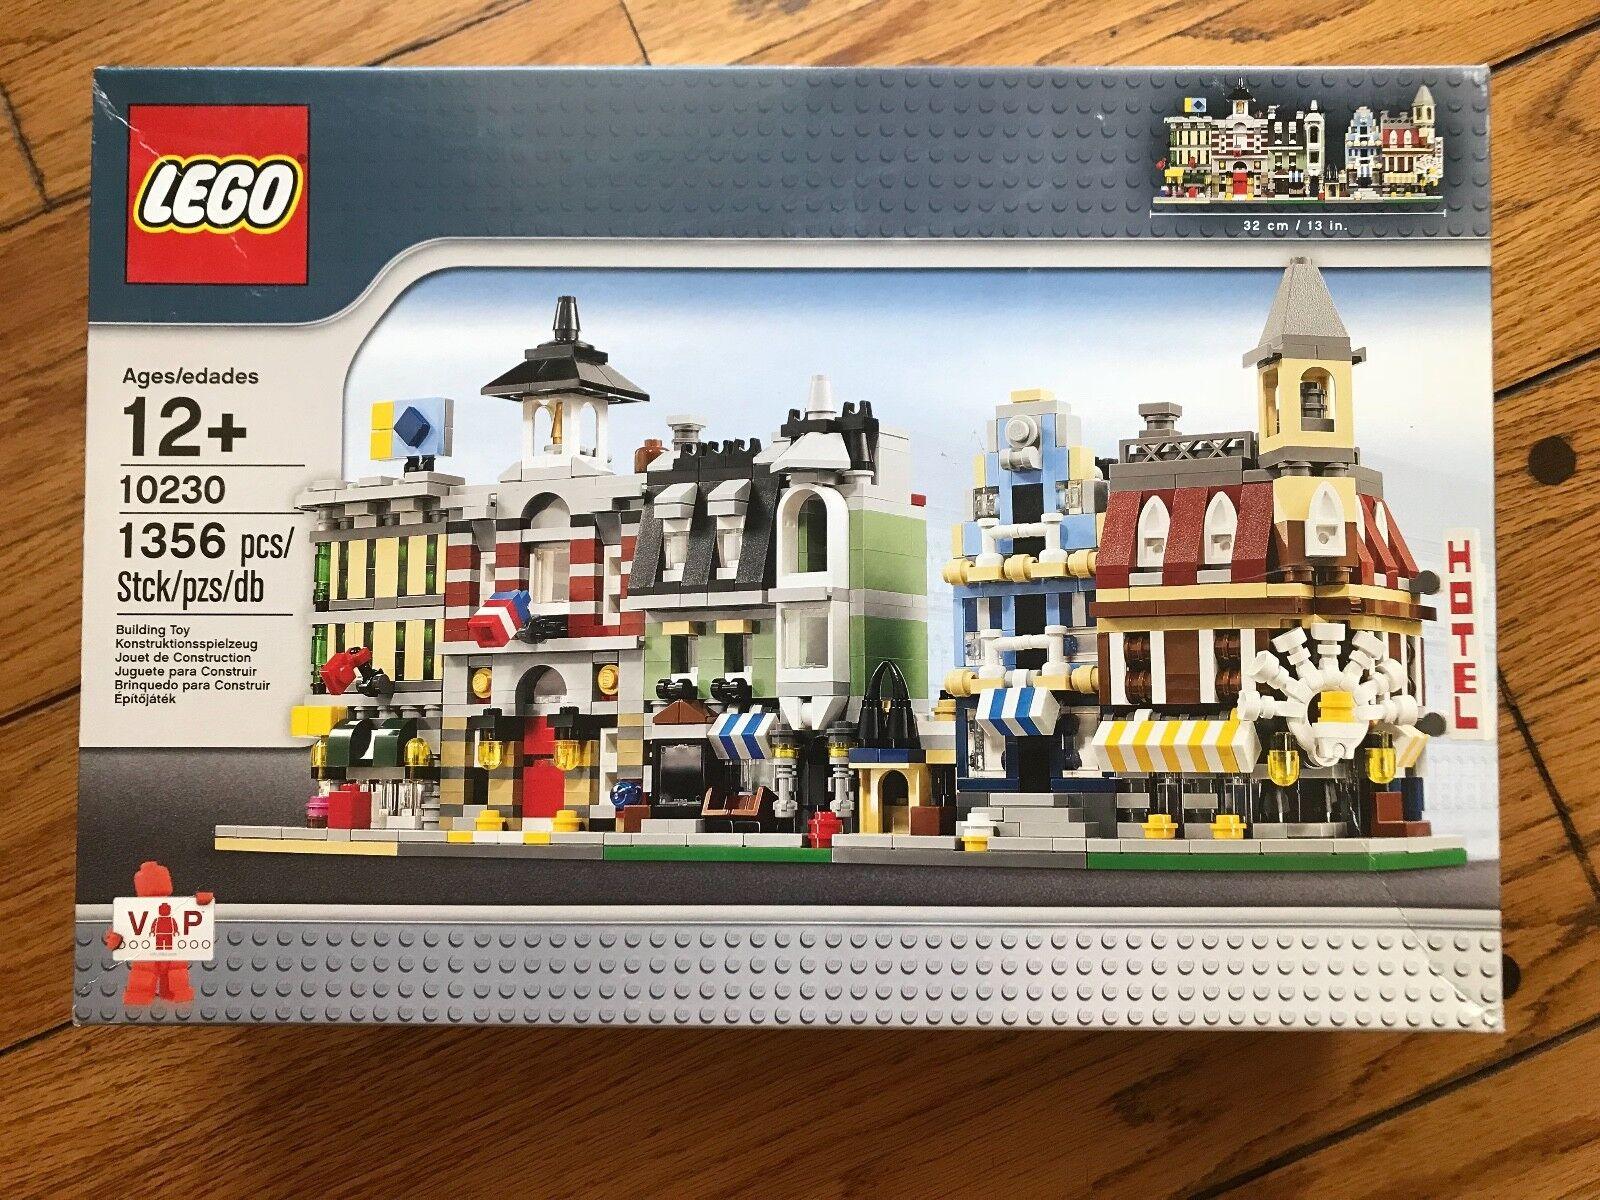 BRe nuovo Lego 10230 MINI MODULARS  With  some very light shelf wear   alta qualità